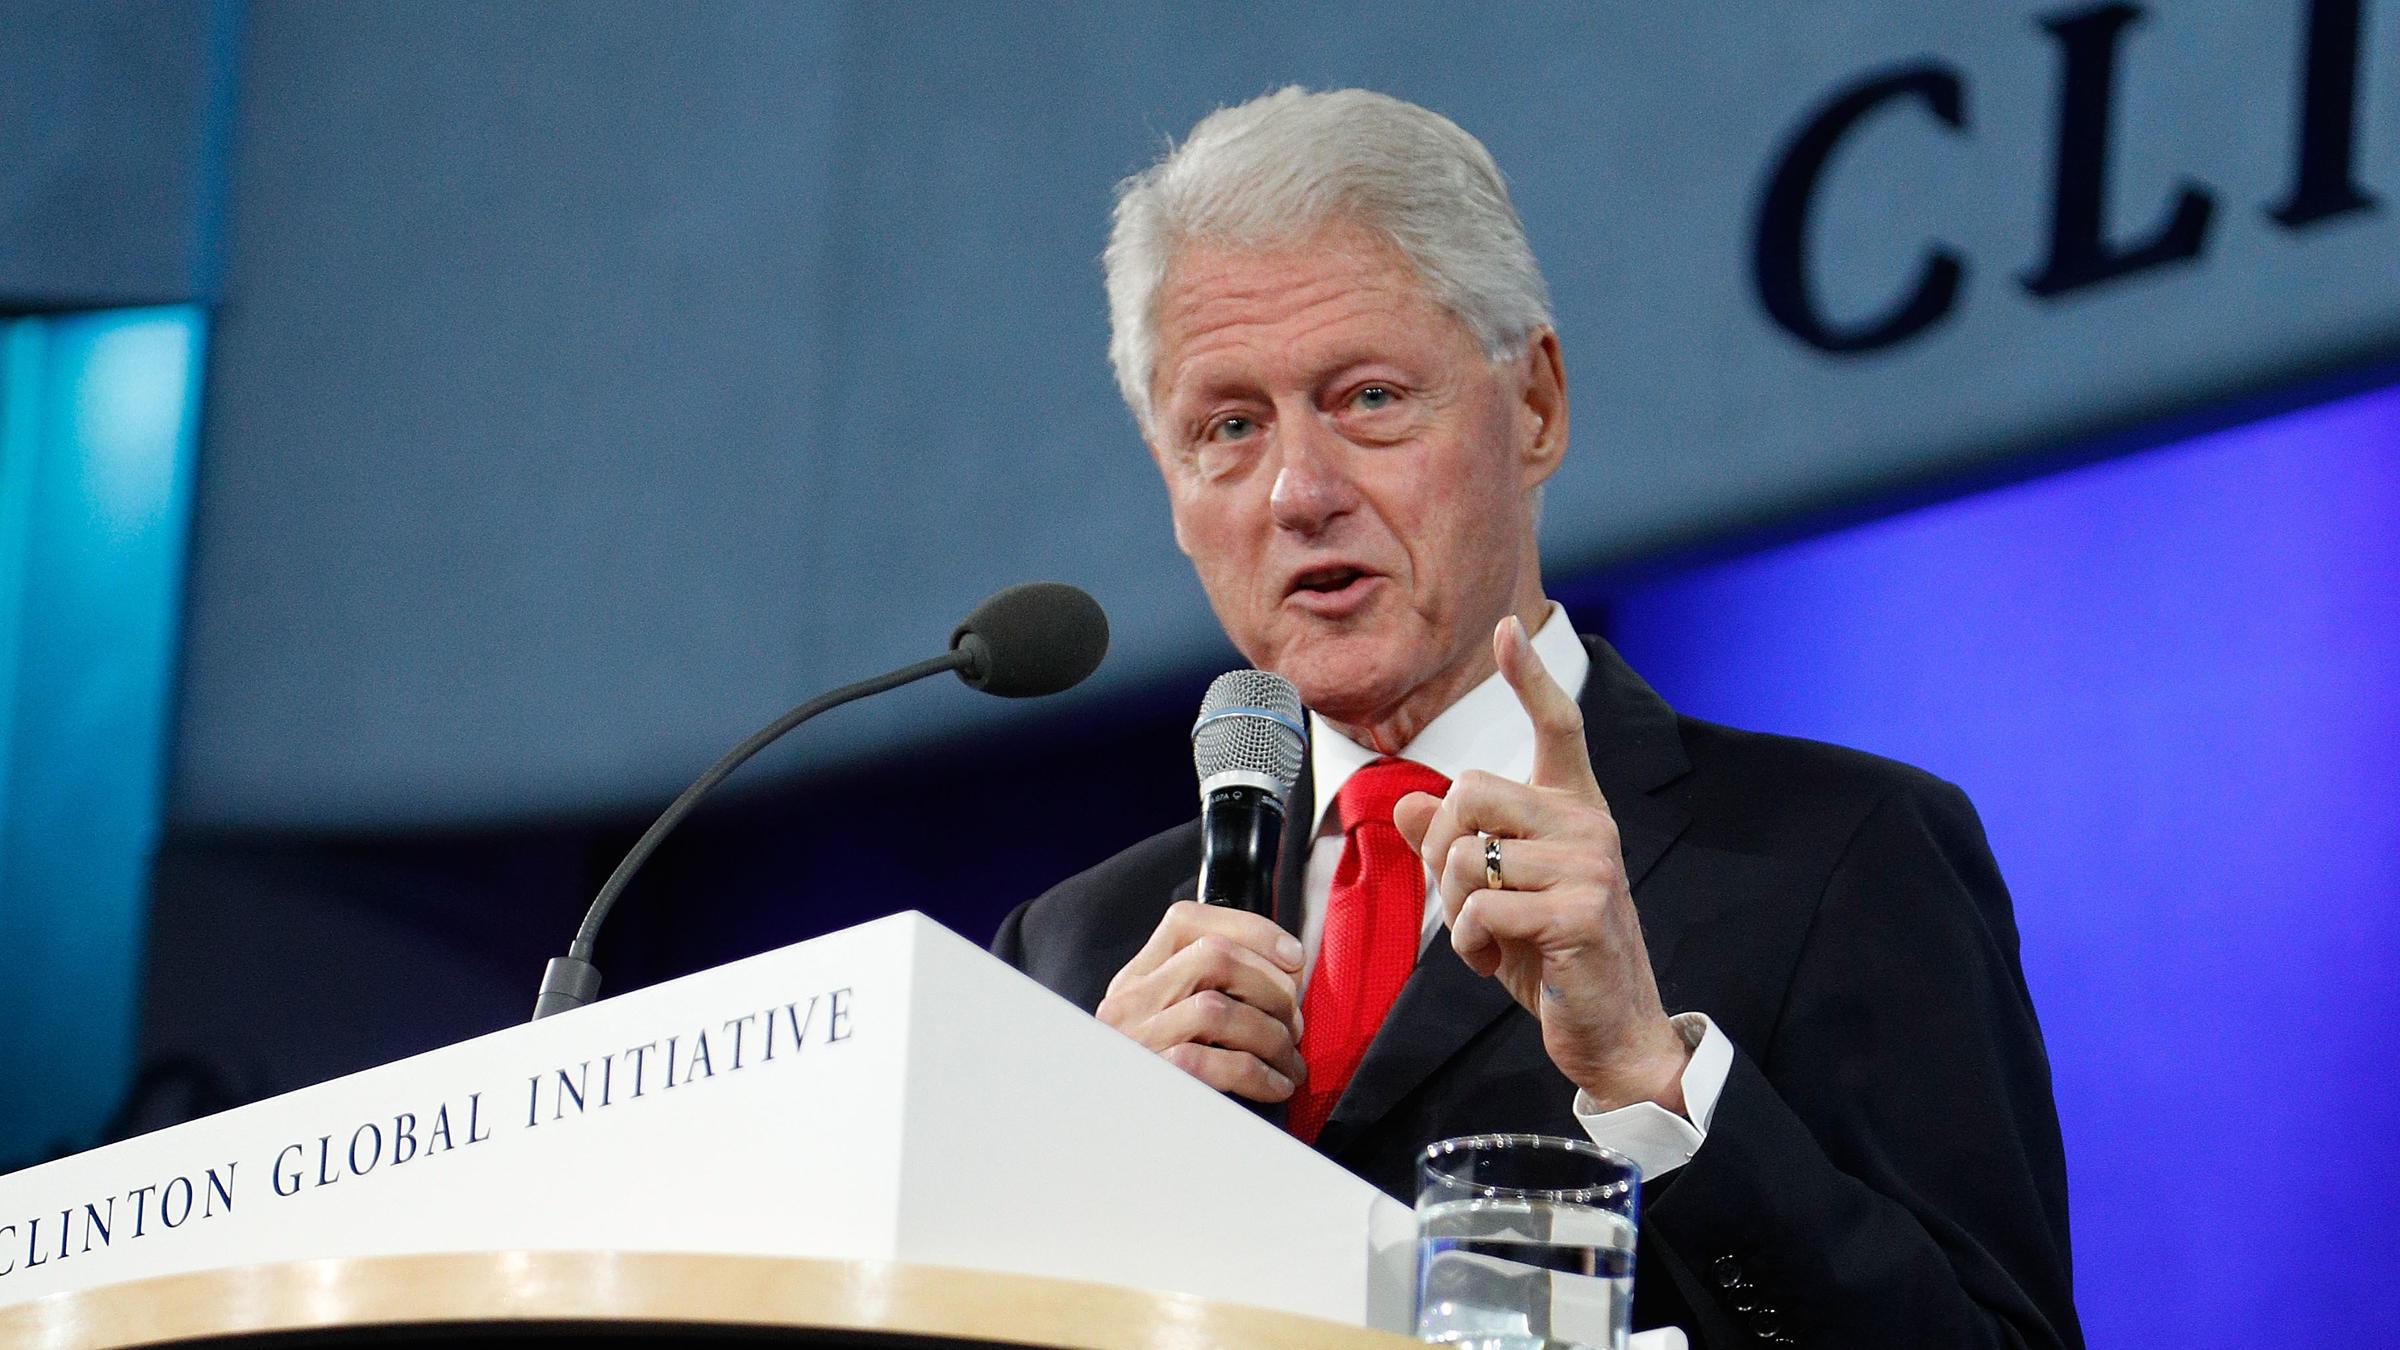 Bill clinton news